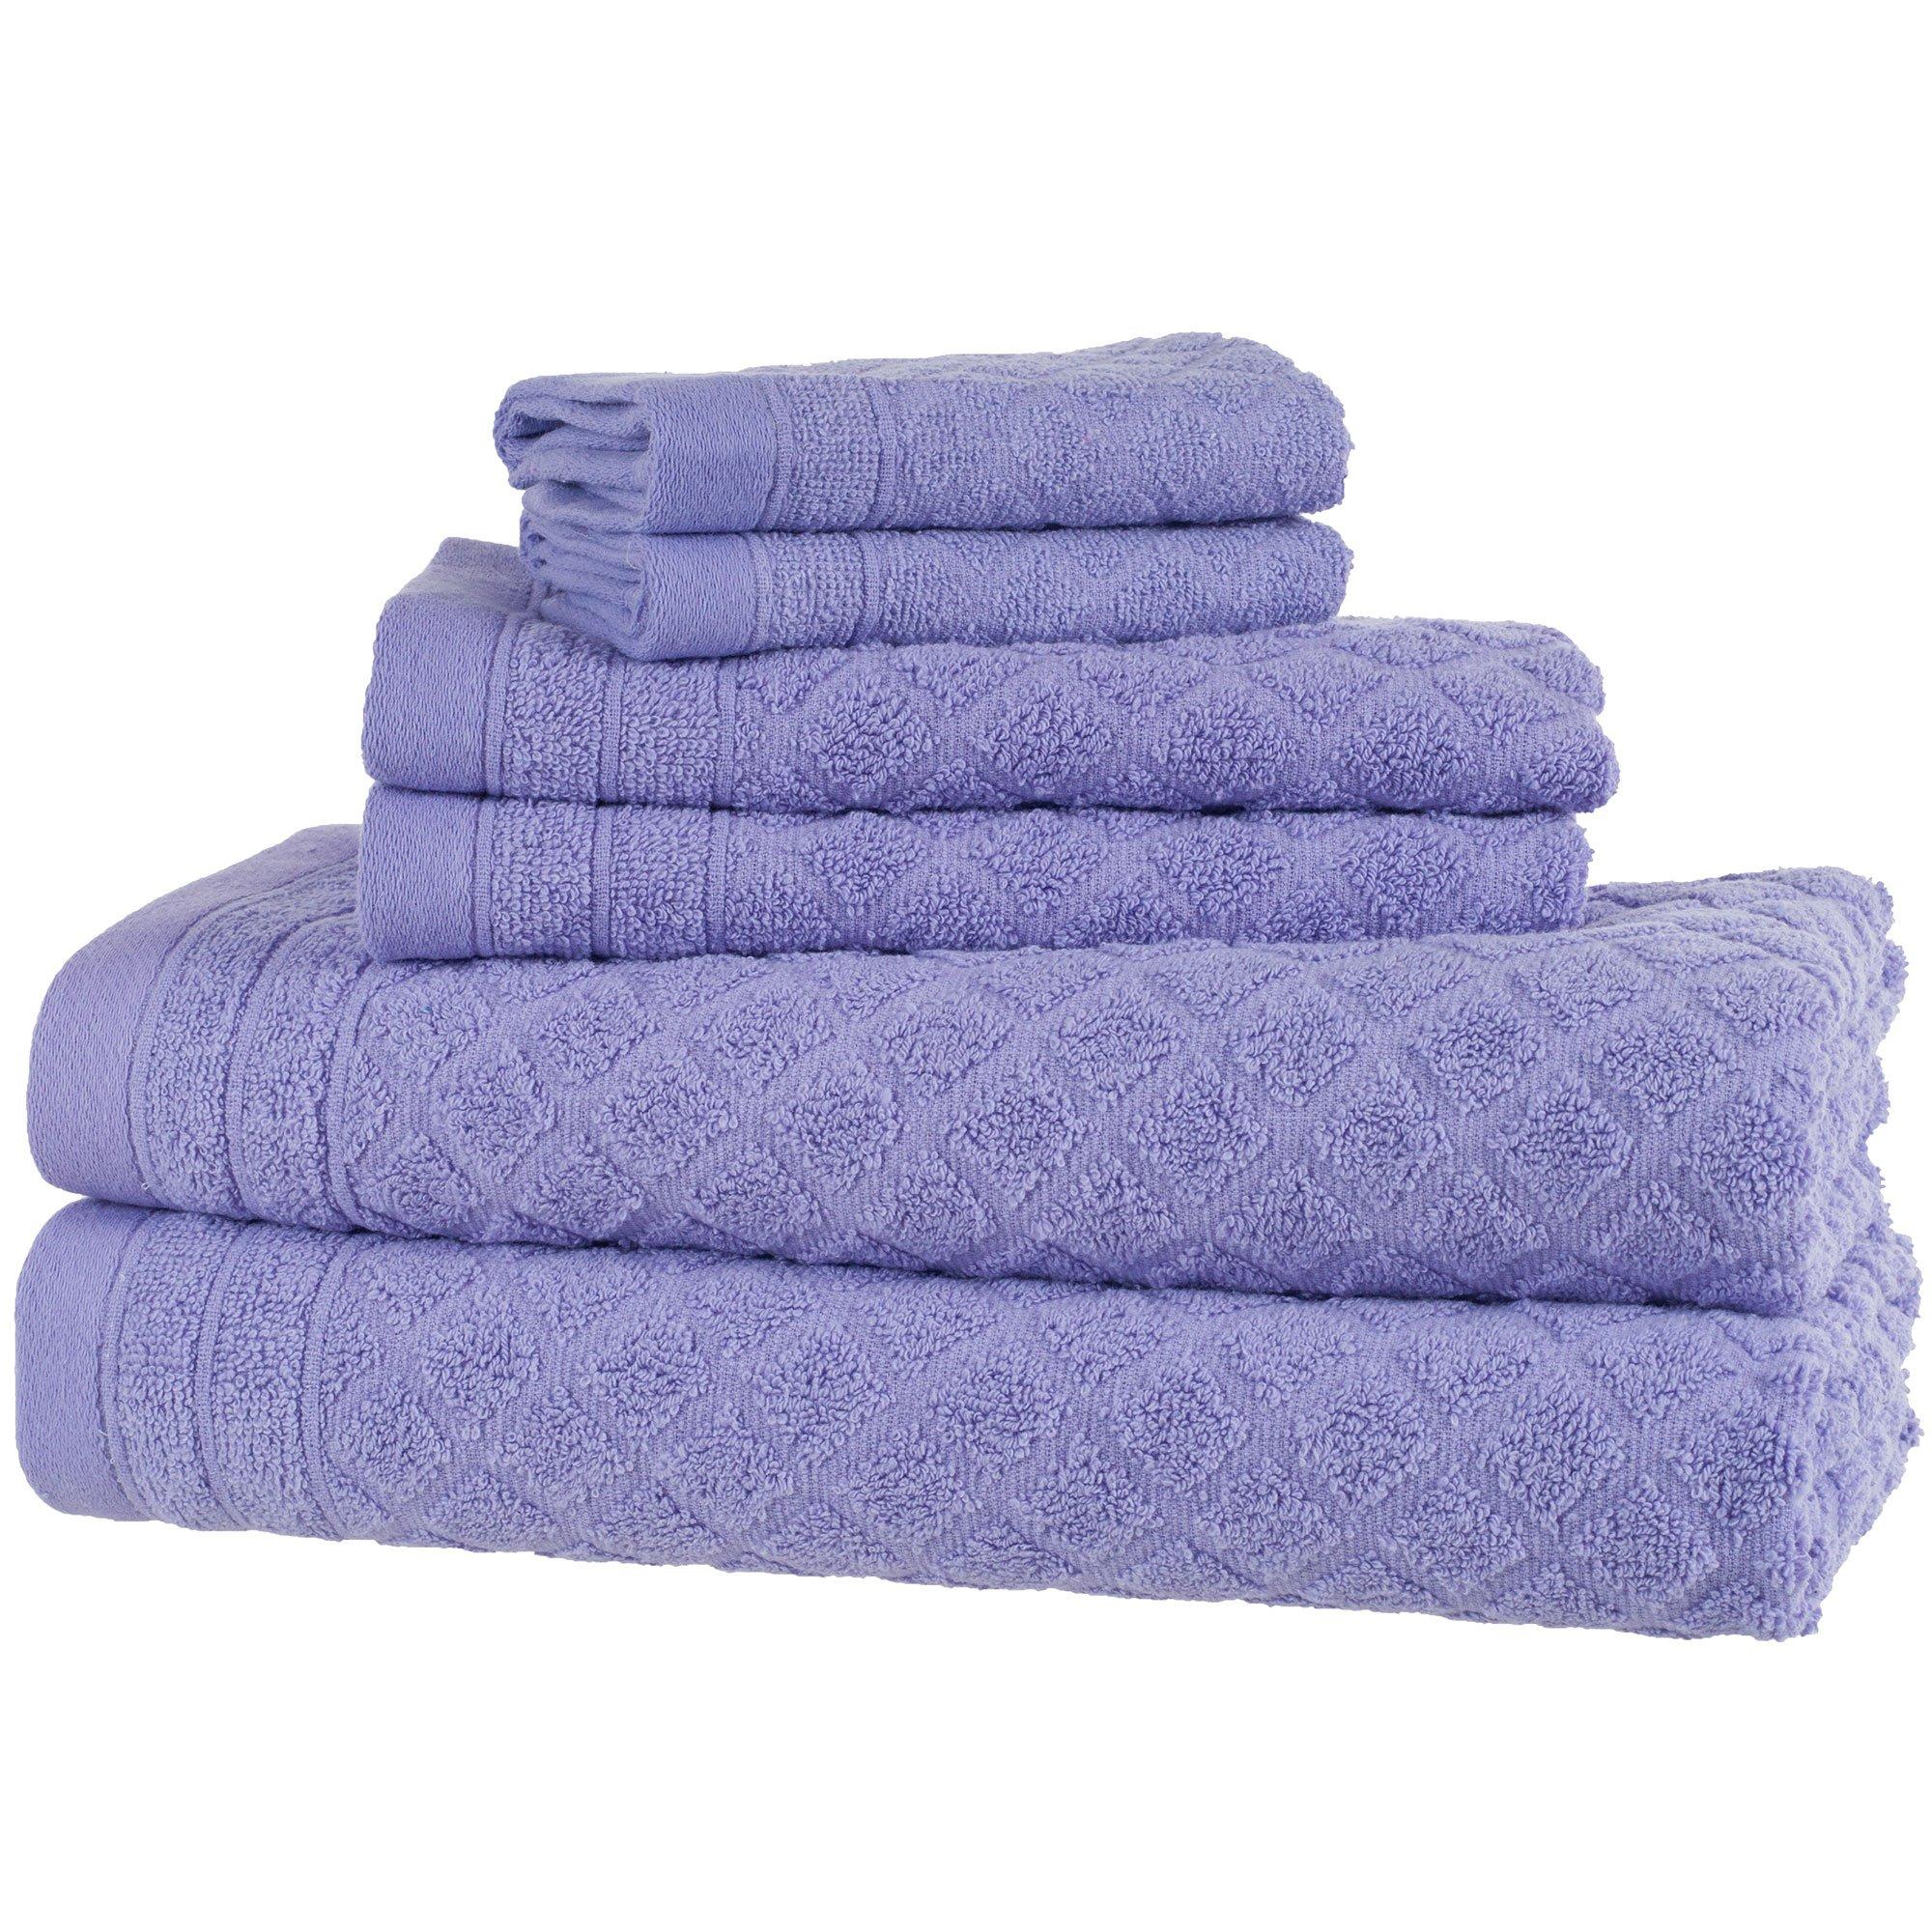 Everyday Home 6-Piece Bath Towel Set, Purple